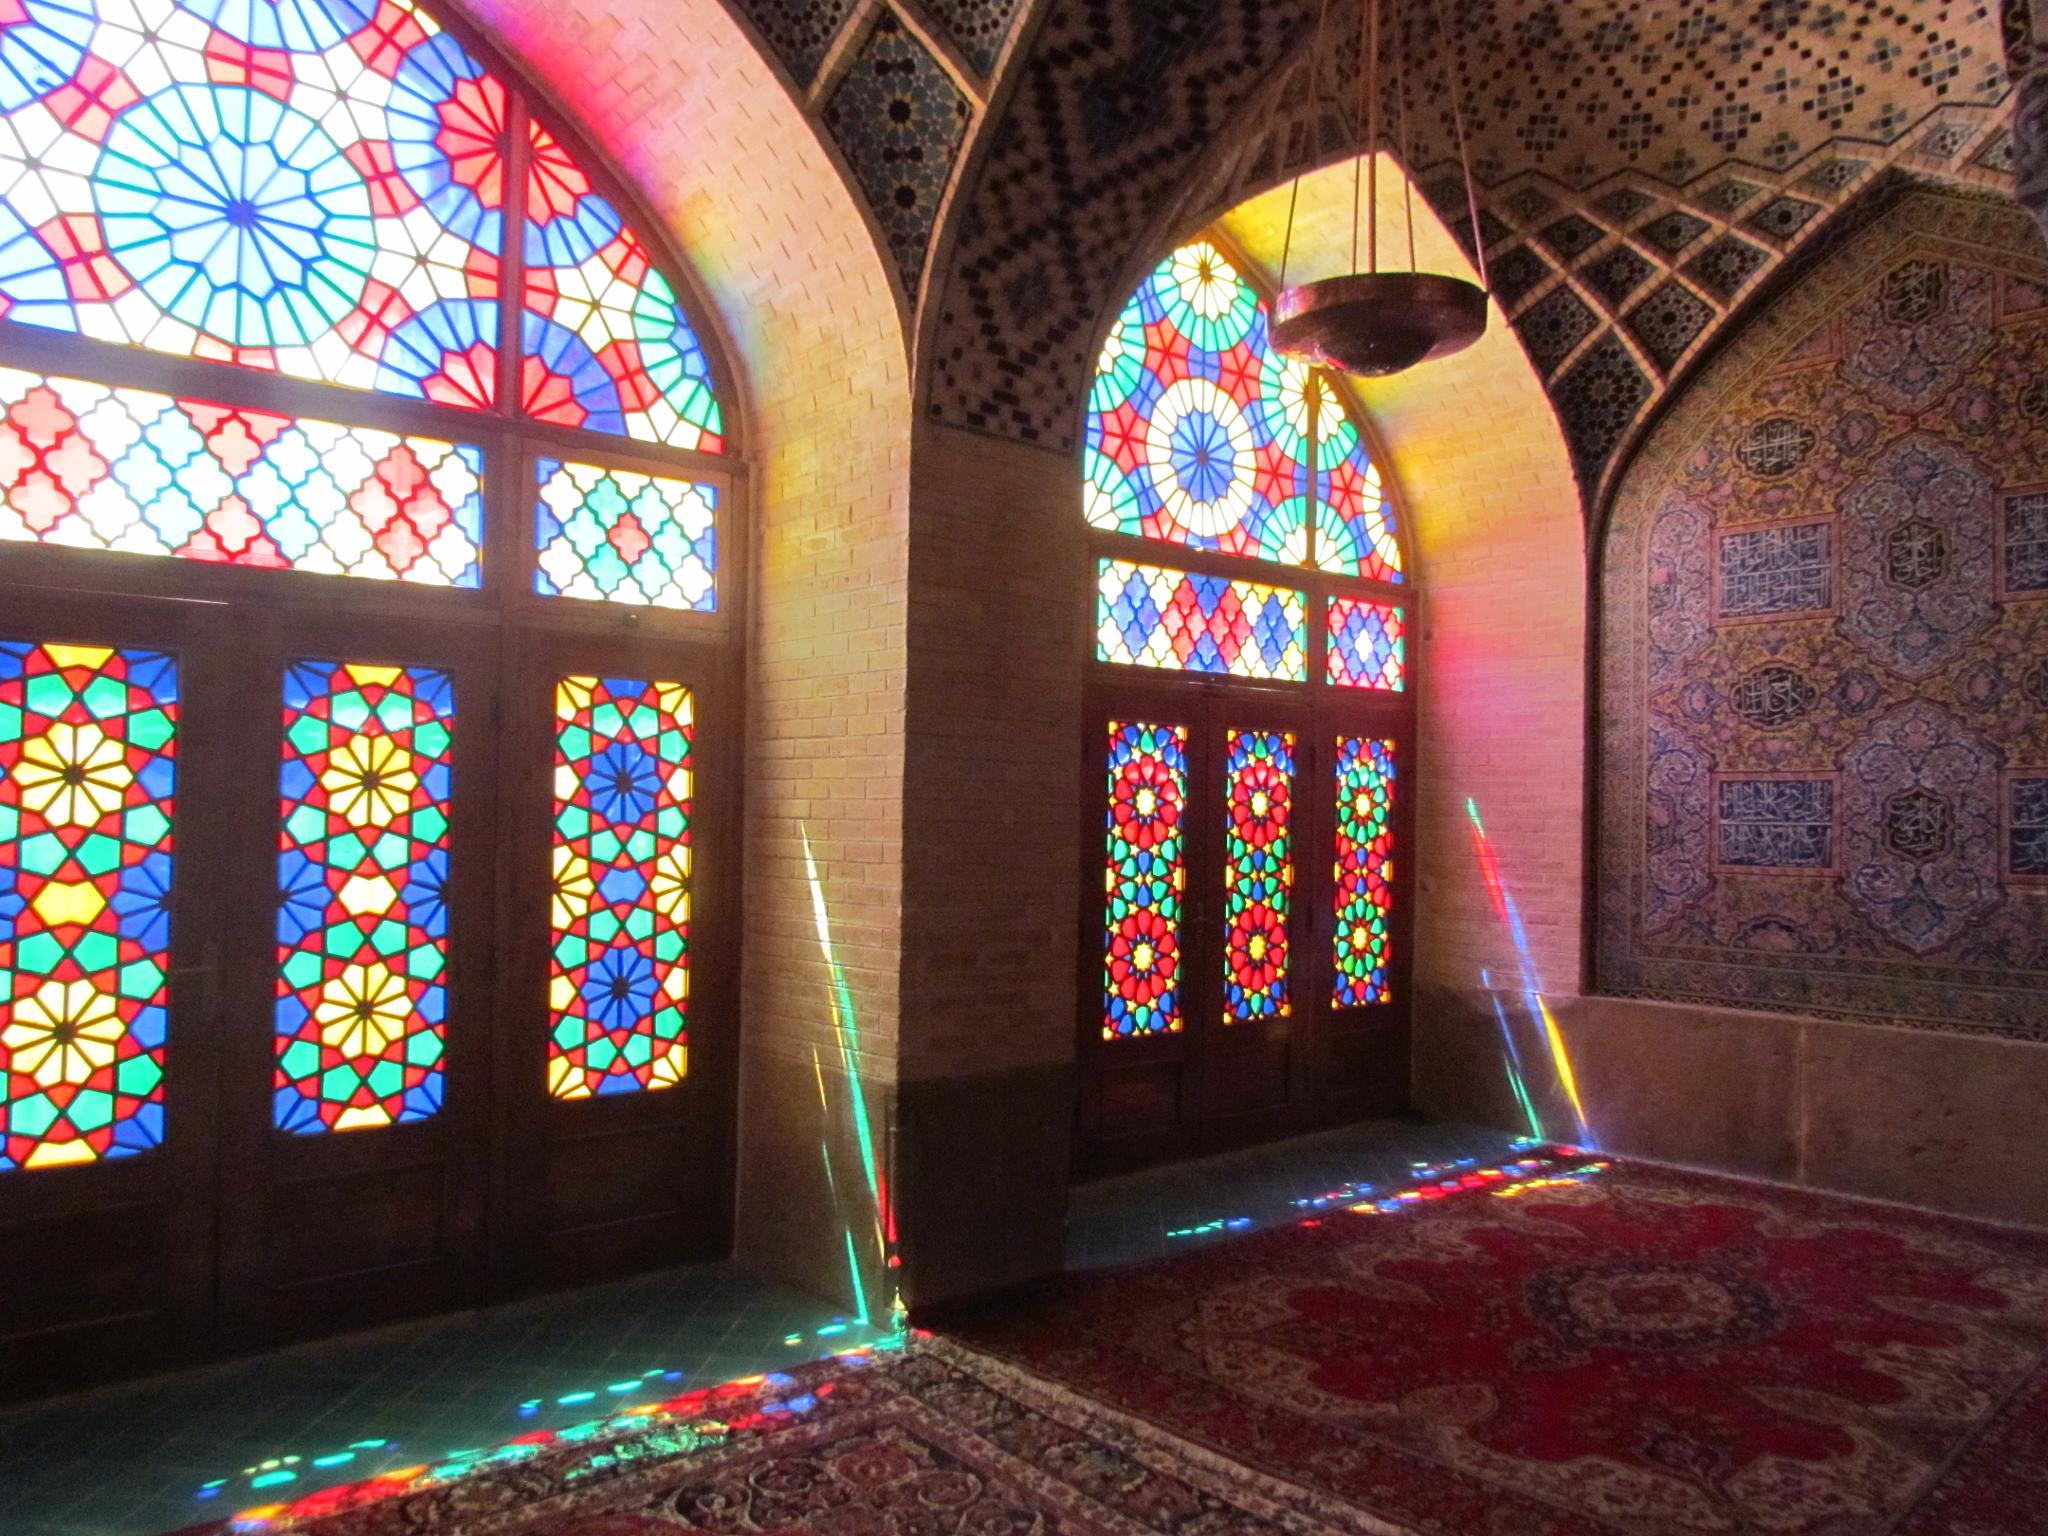 Nasir ol molk Mosque by Sadegh Roozbehi